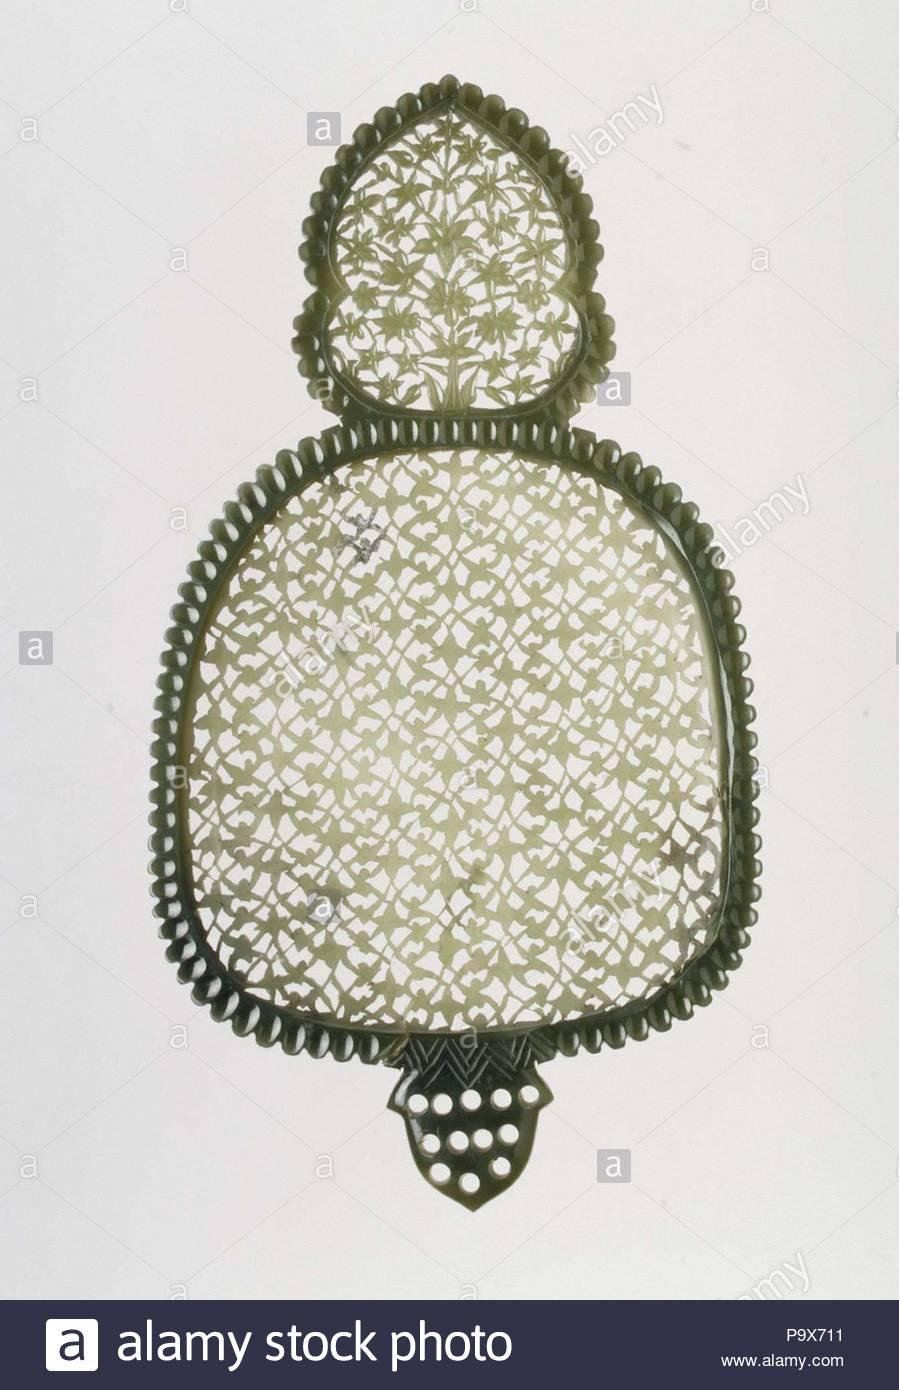 Mughal Period Stock Photos & Mughal Period Stock Images - Alamy